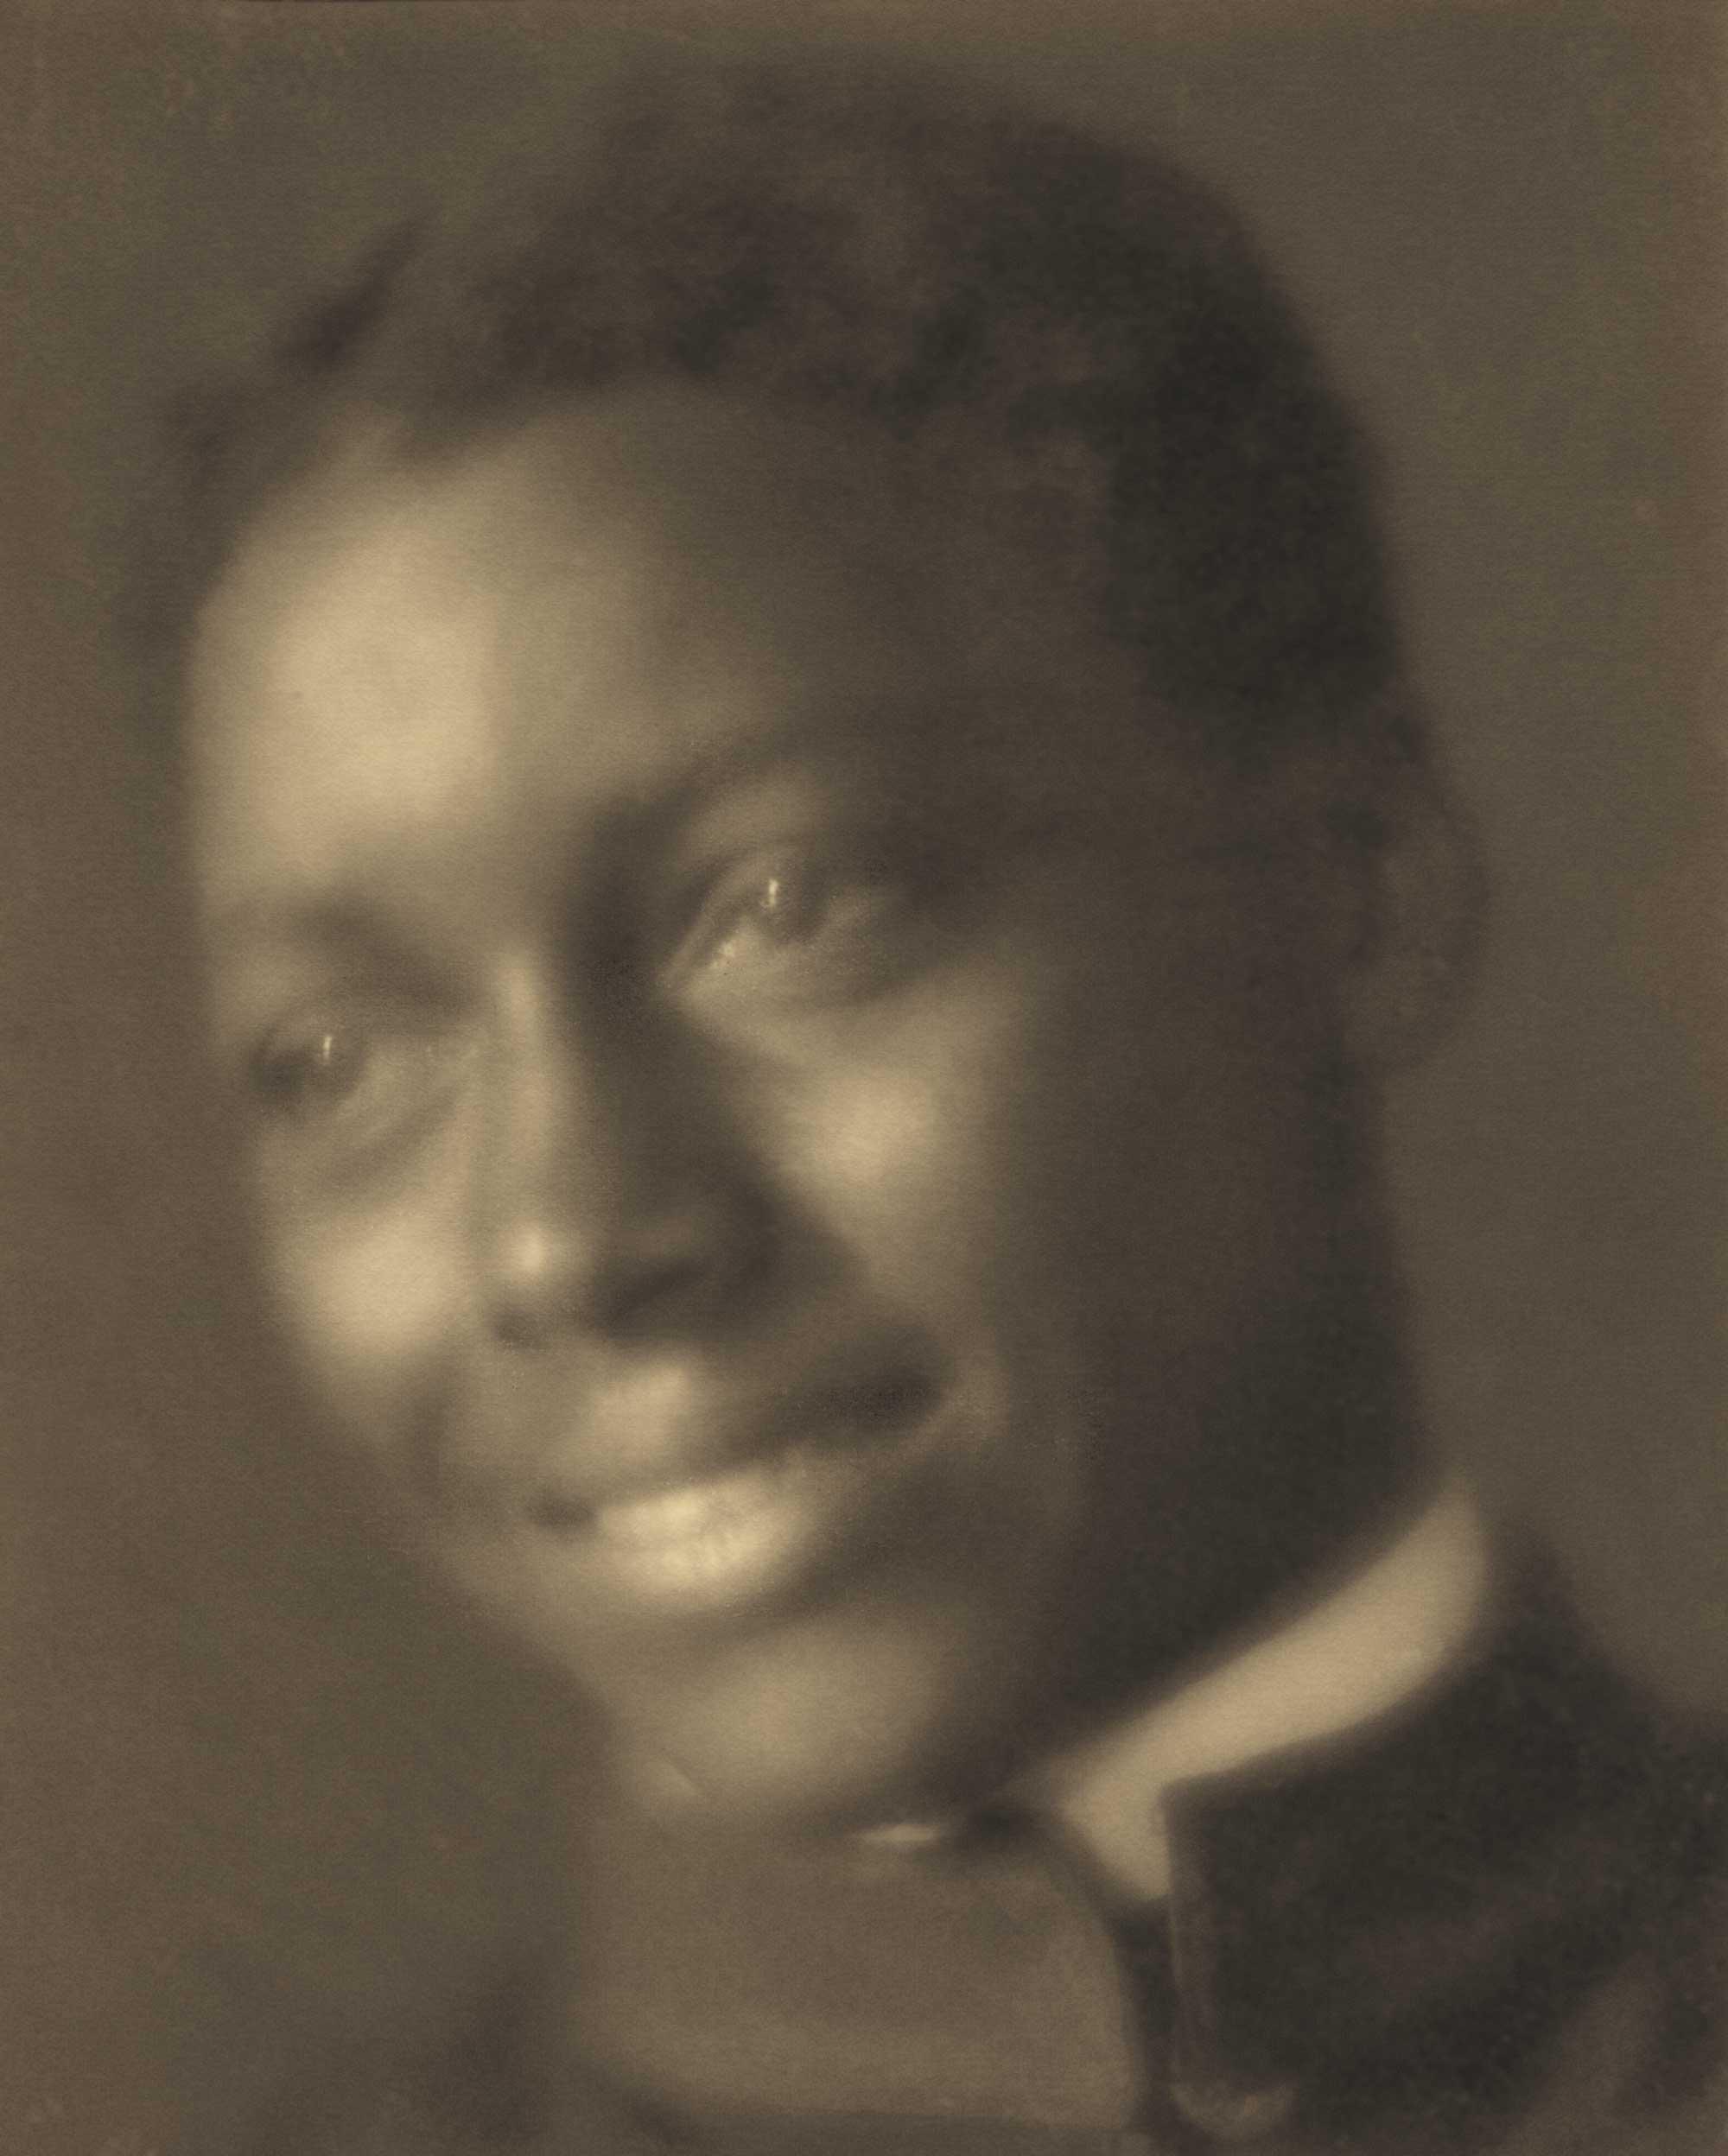 c. 1905: African American man wearing the Hampton Institute uniform